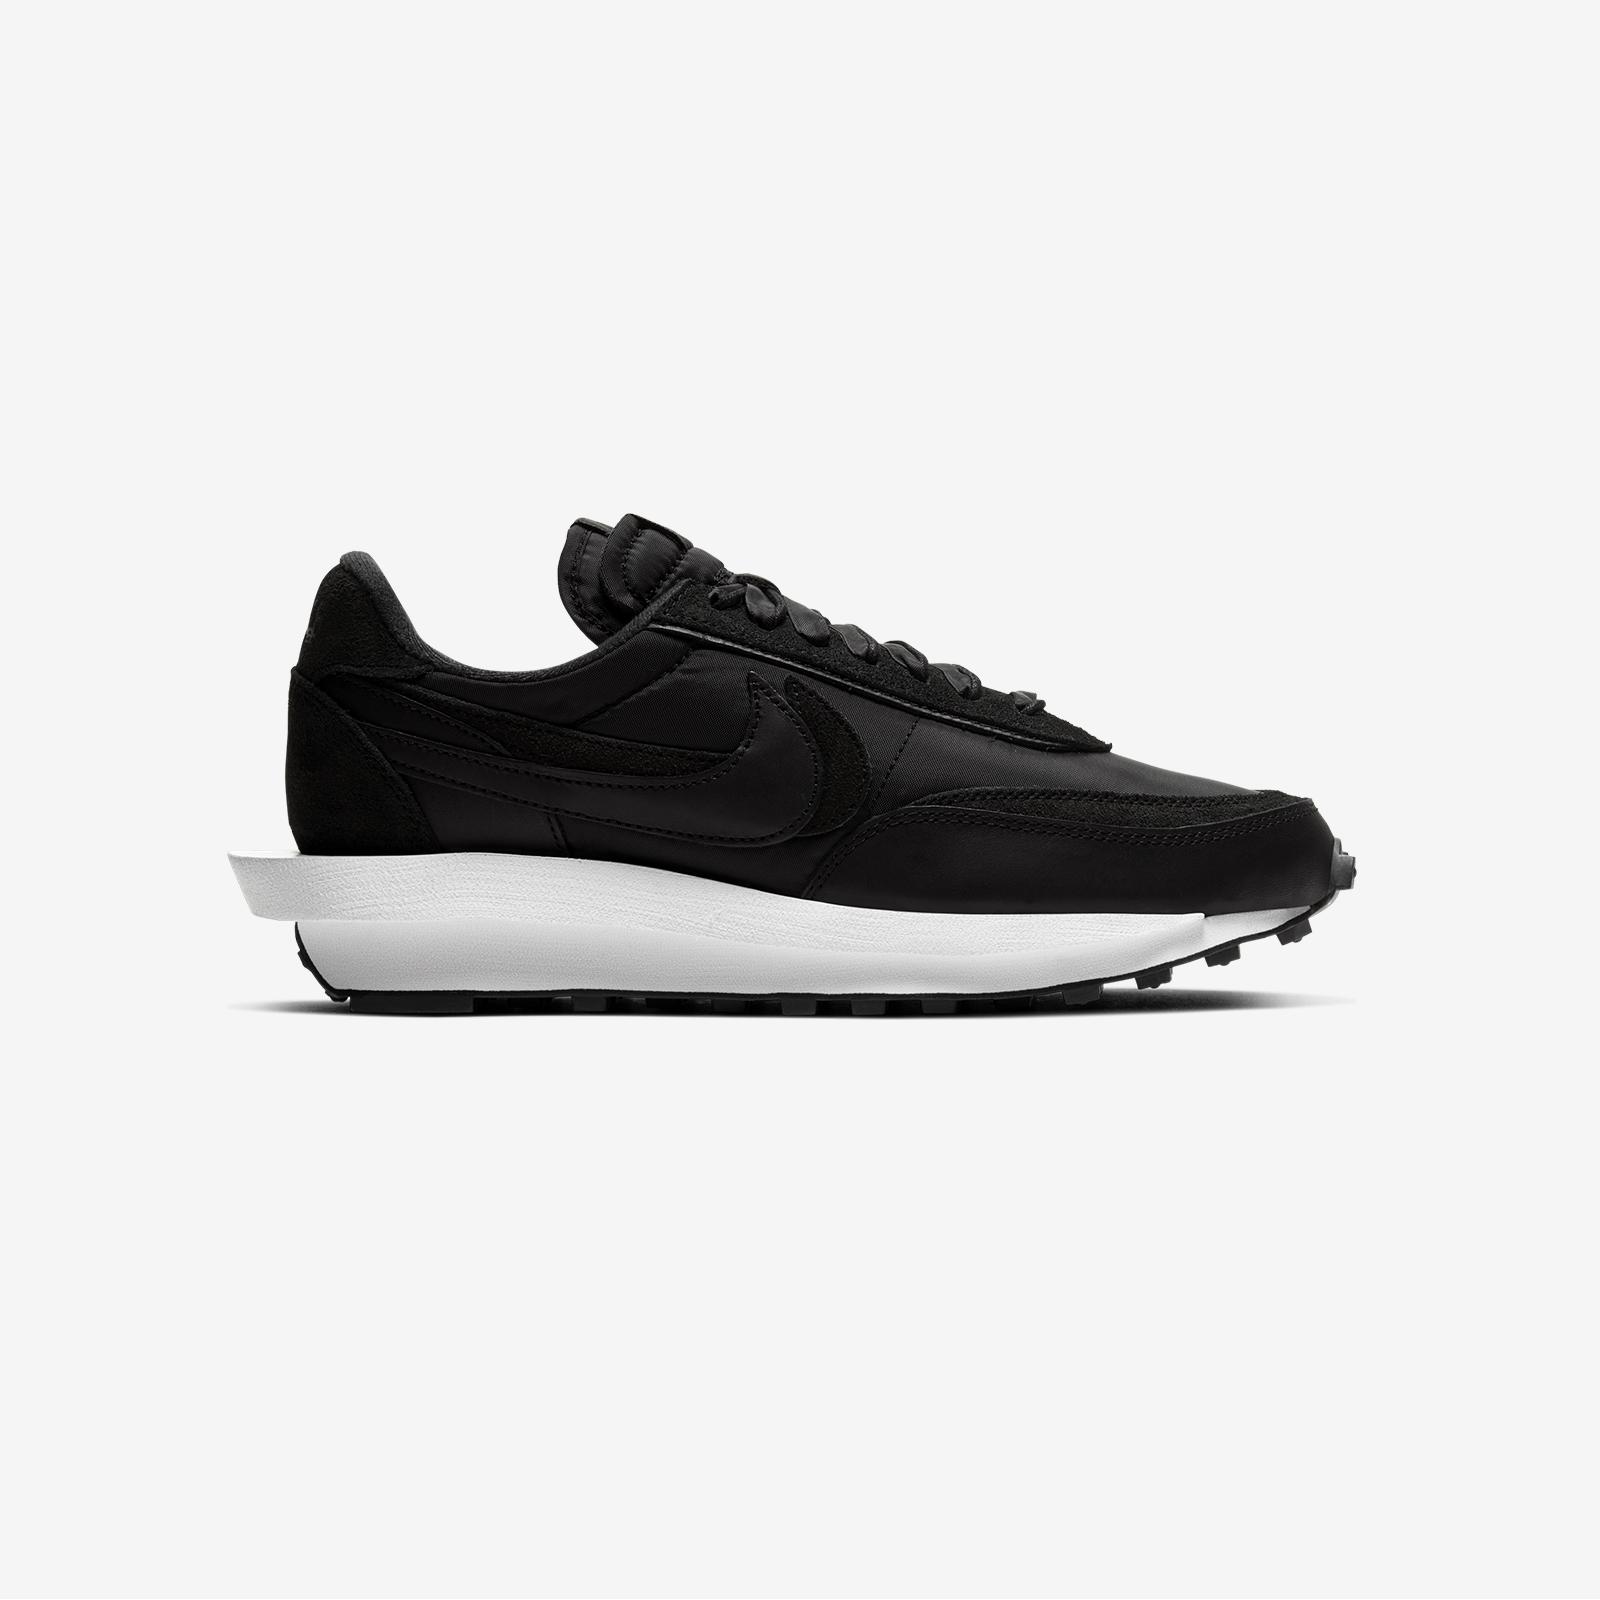 Nike LDWaffle / SACAI - Bv0073-002